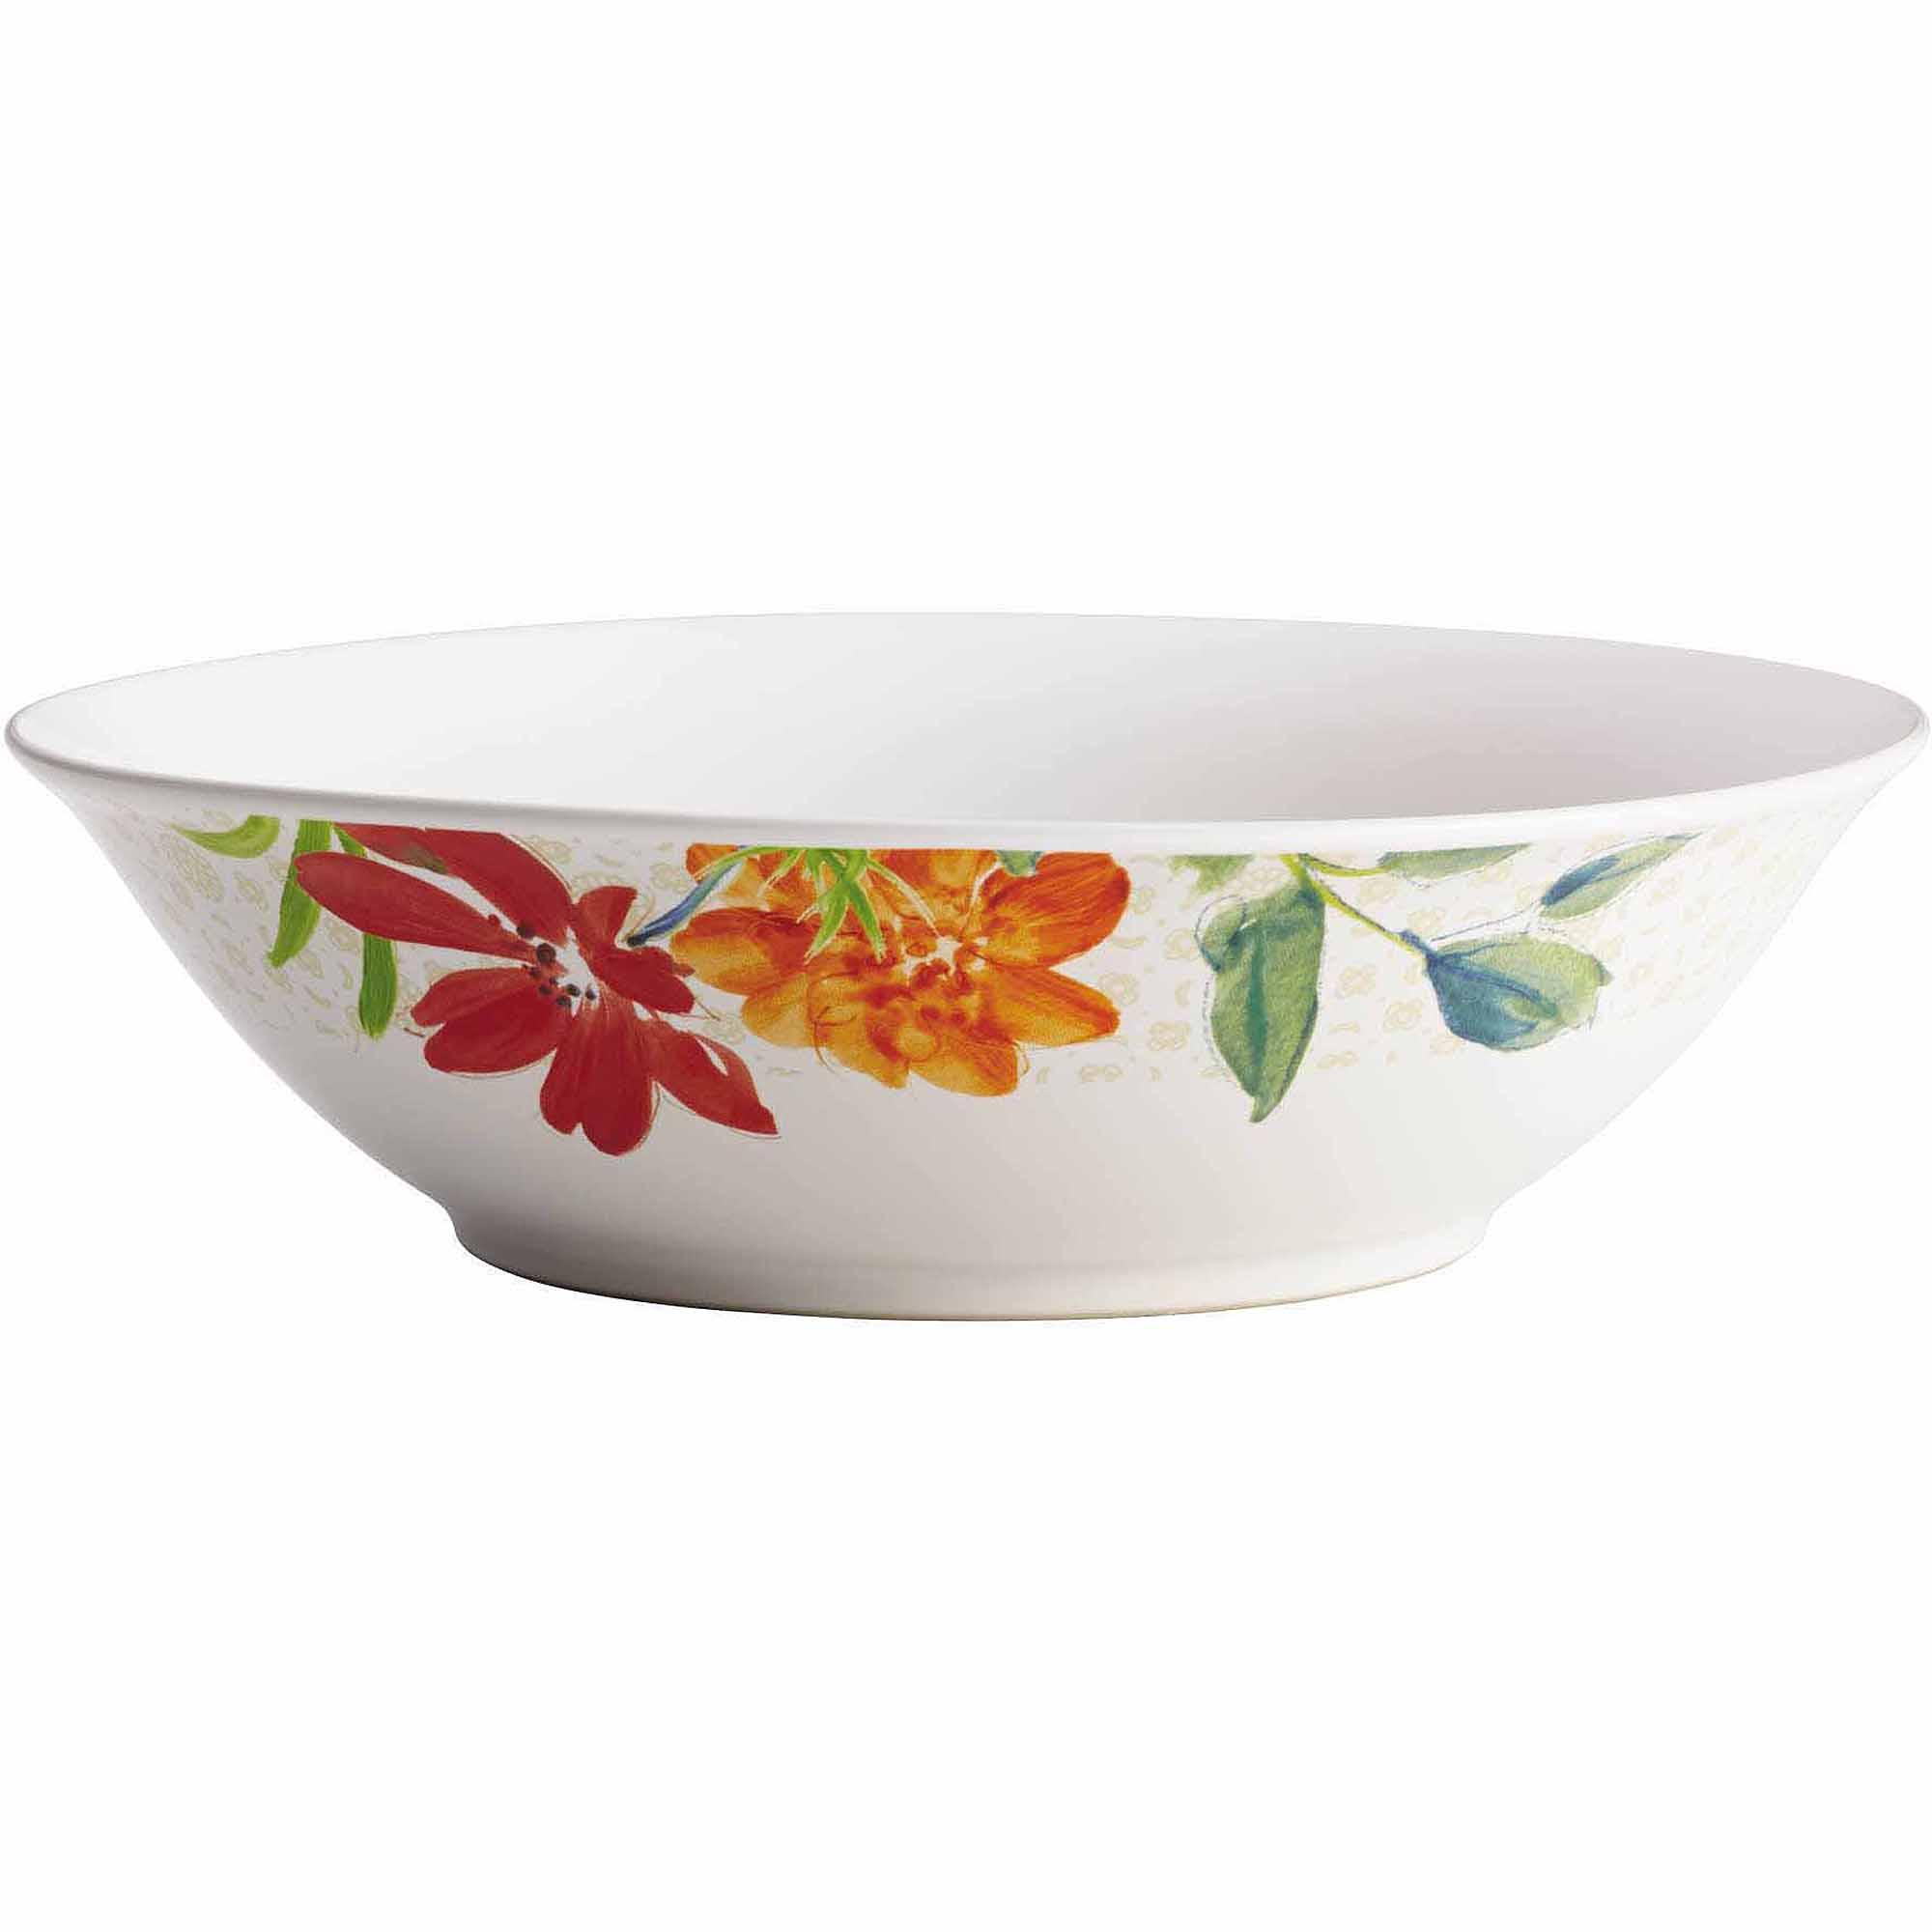 "BonJour Dinnerware Al Fresco StoNeware 10"" Serving Bowl by Meyer Corporation"